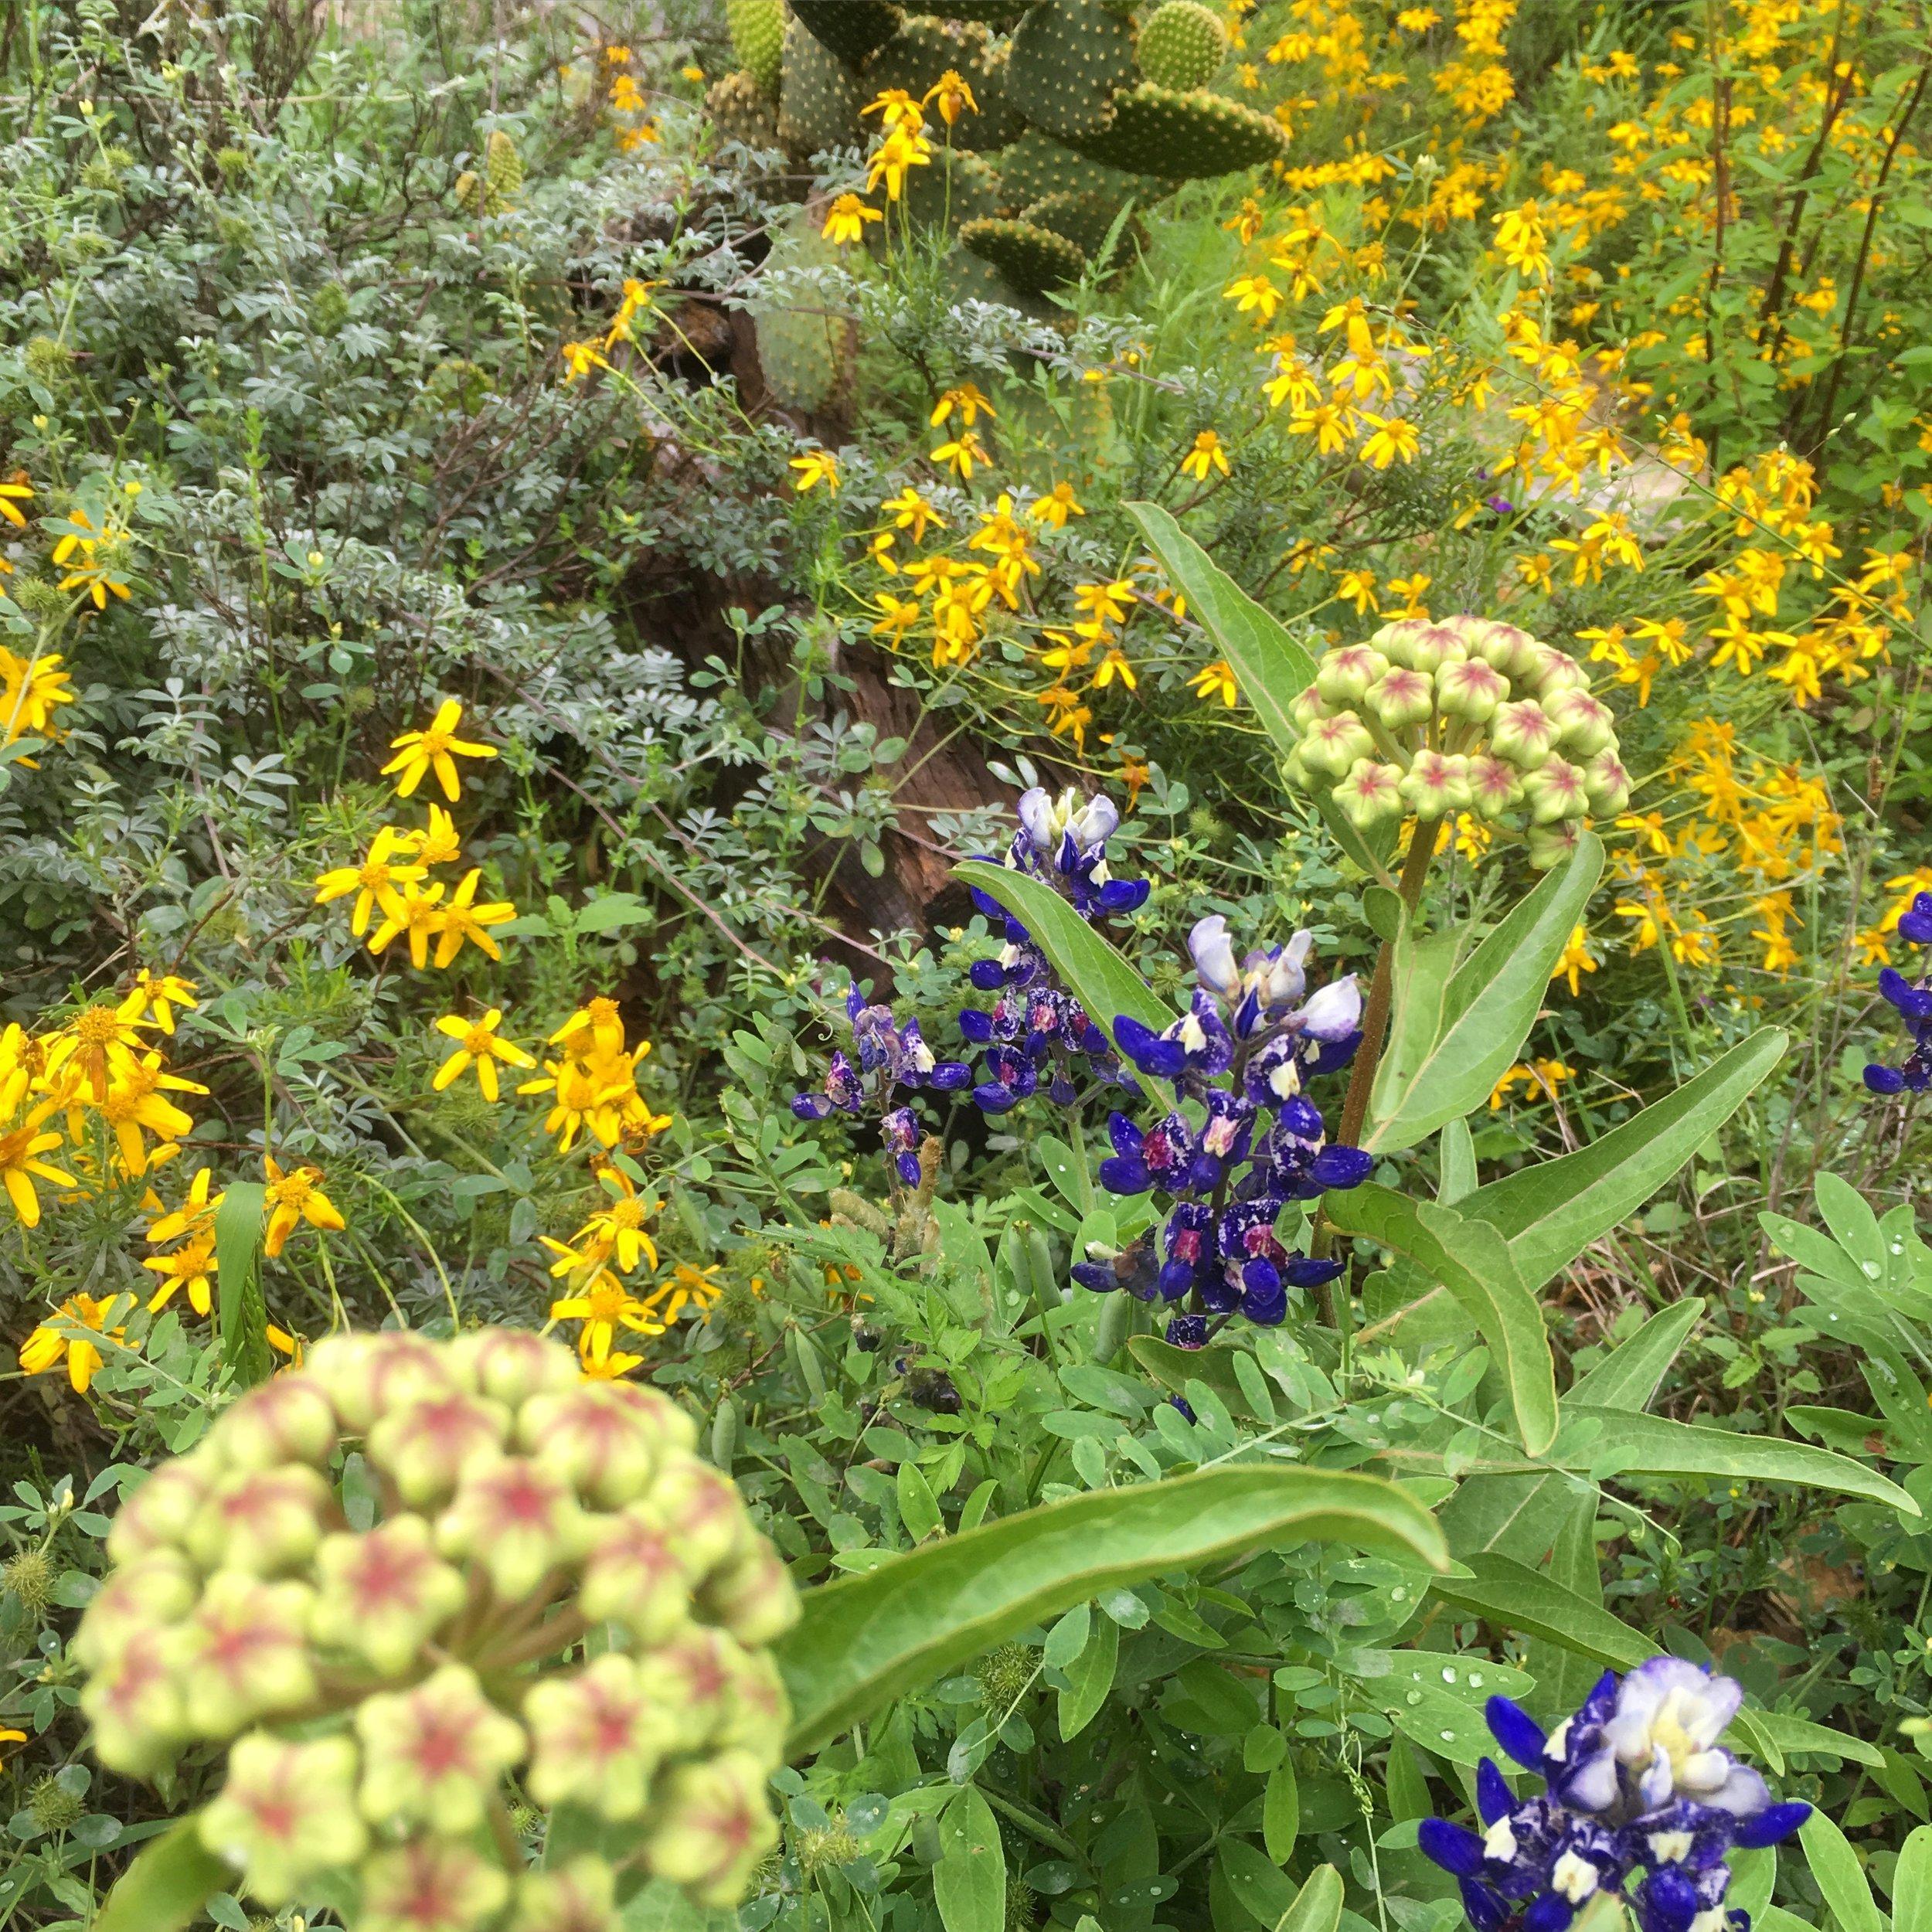 Antelope Horn milkweed and bluebonnets